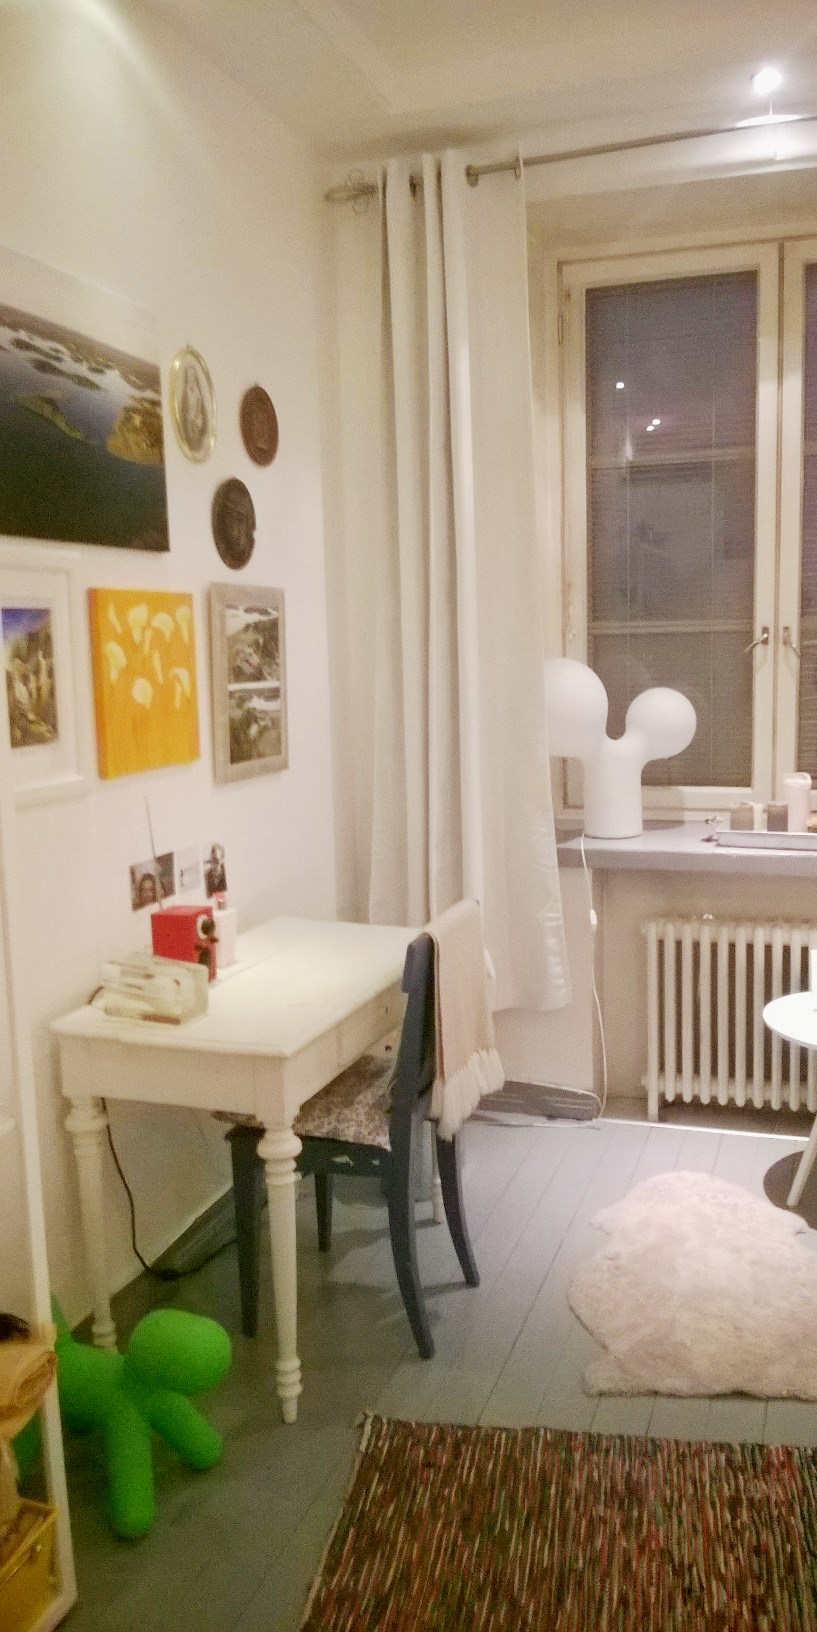 Studio apartment for two in Kallio